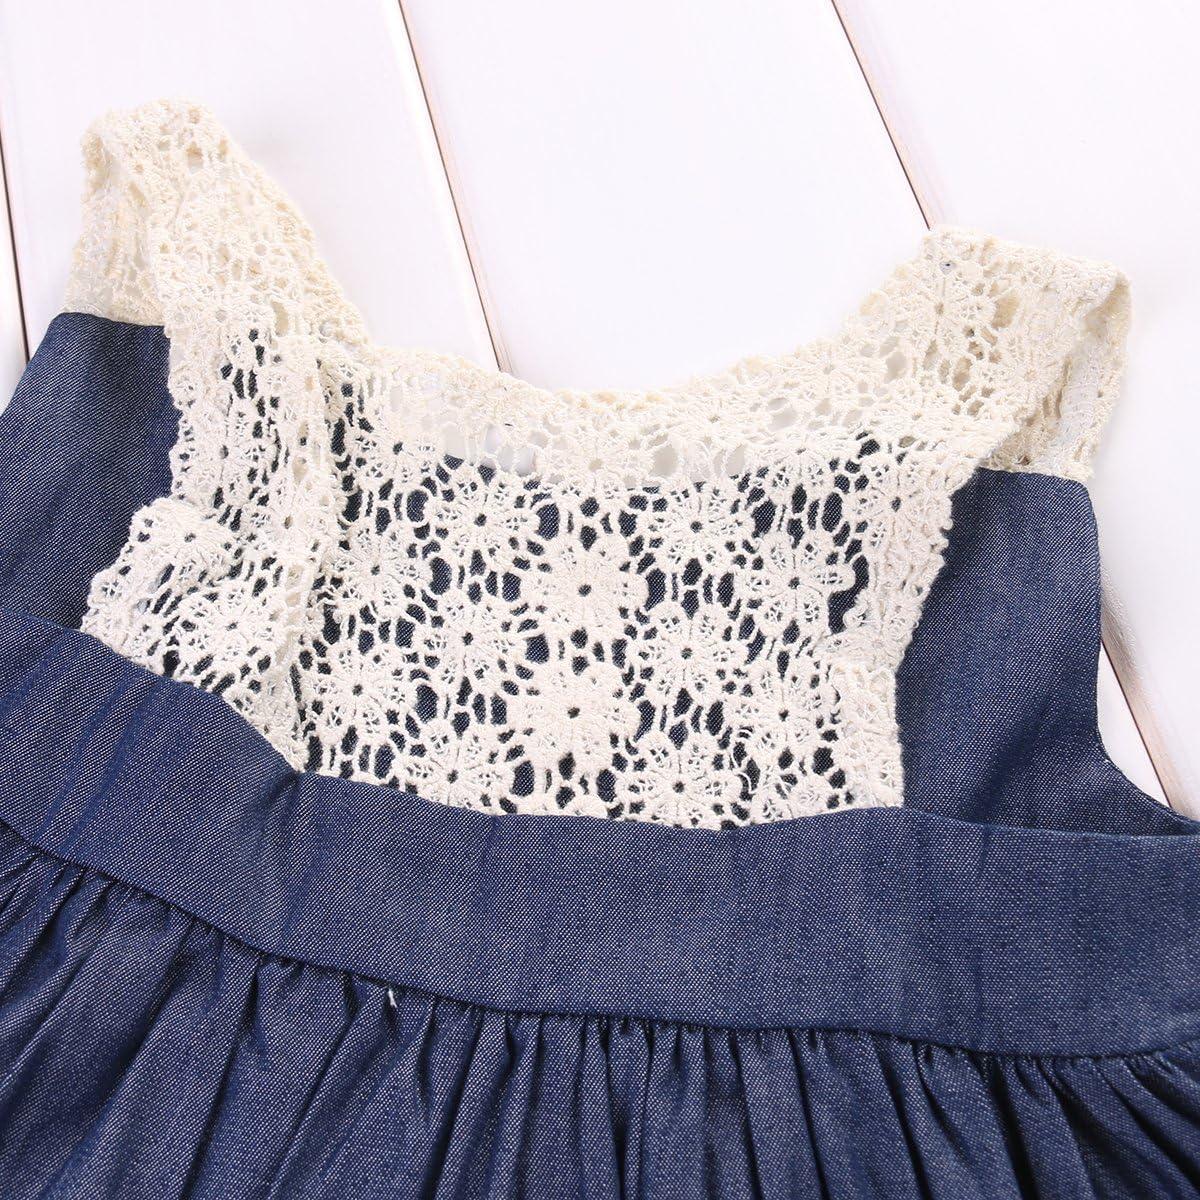 Toddler Kids Baby Girls Sleeveless Lace Collar Denim Ruffle Dress Short Pants Outfits 2Pcs Clothes Set